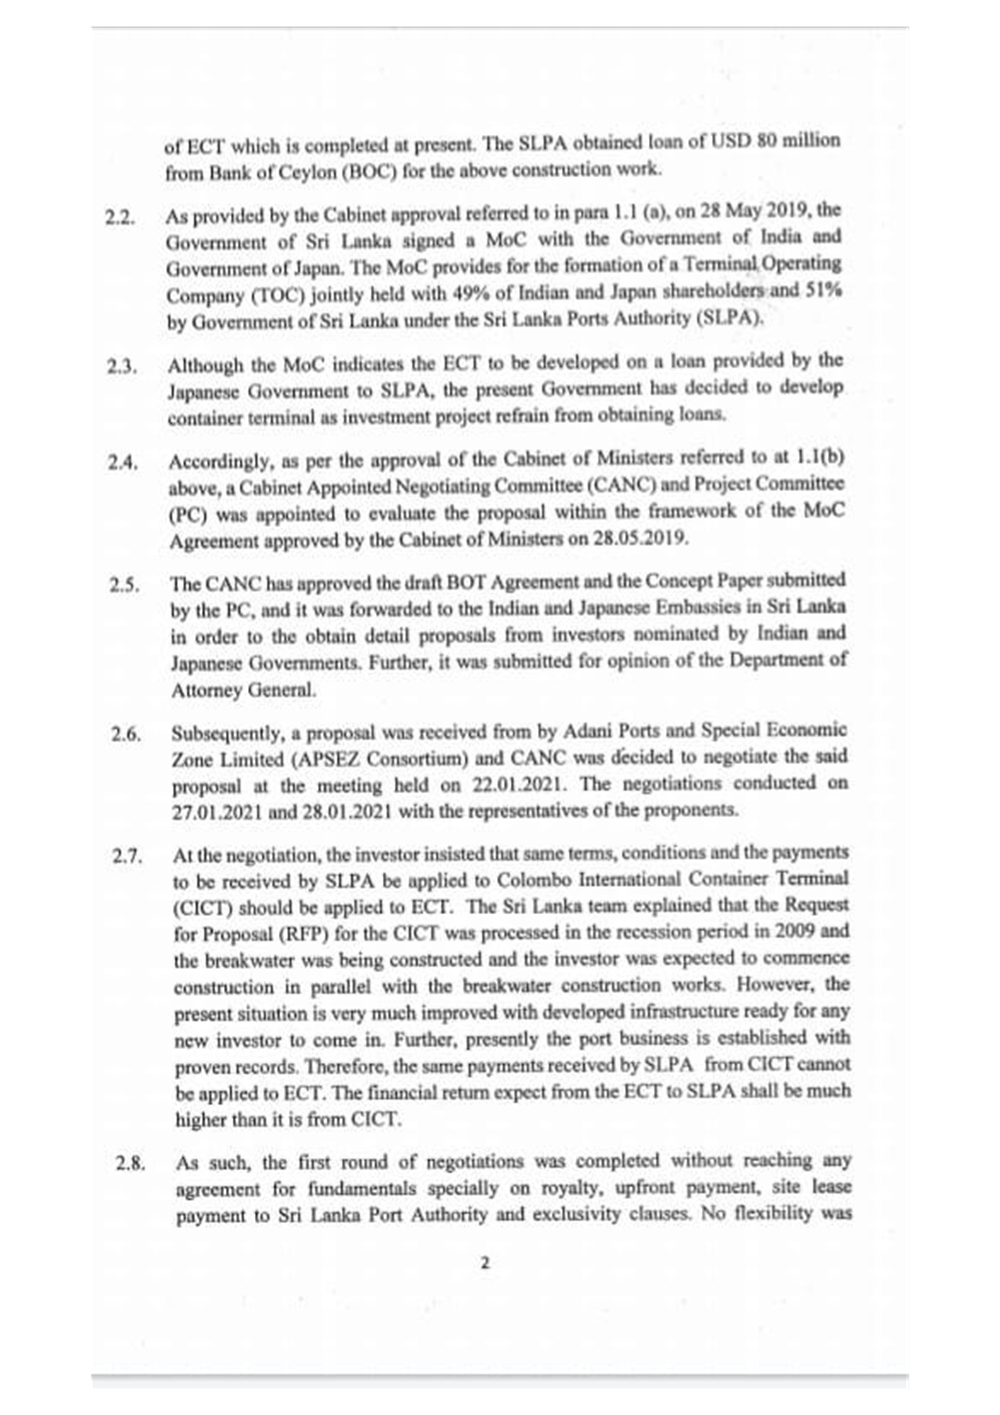 Sri Lankan Government Cabinet Memorandum 31 January 2021, p.2